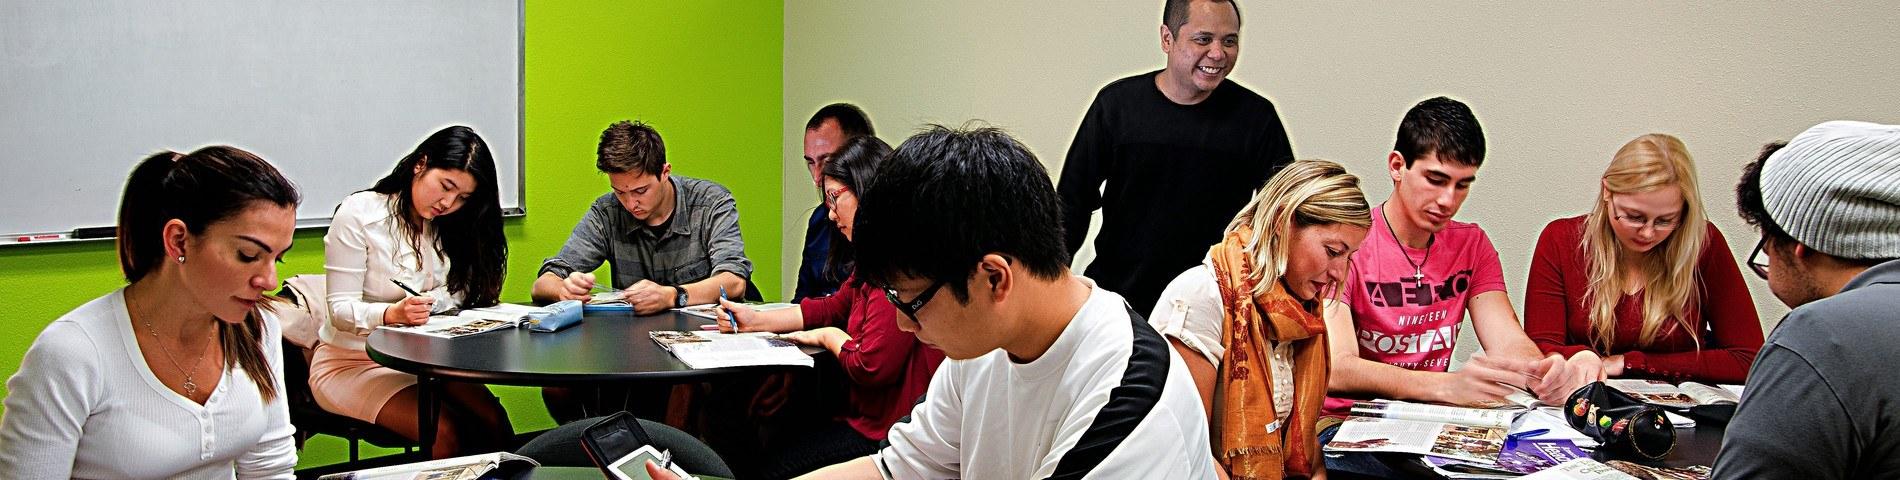 LSI - Language Studies International foto 1